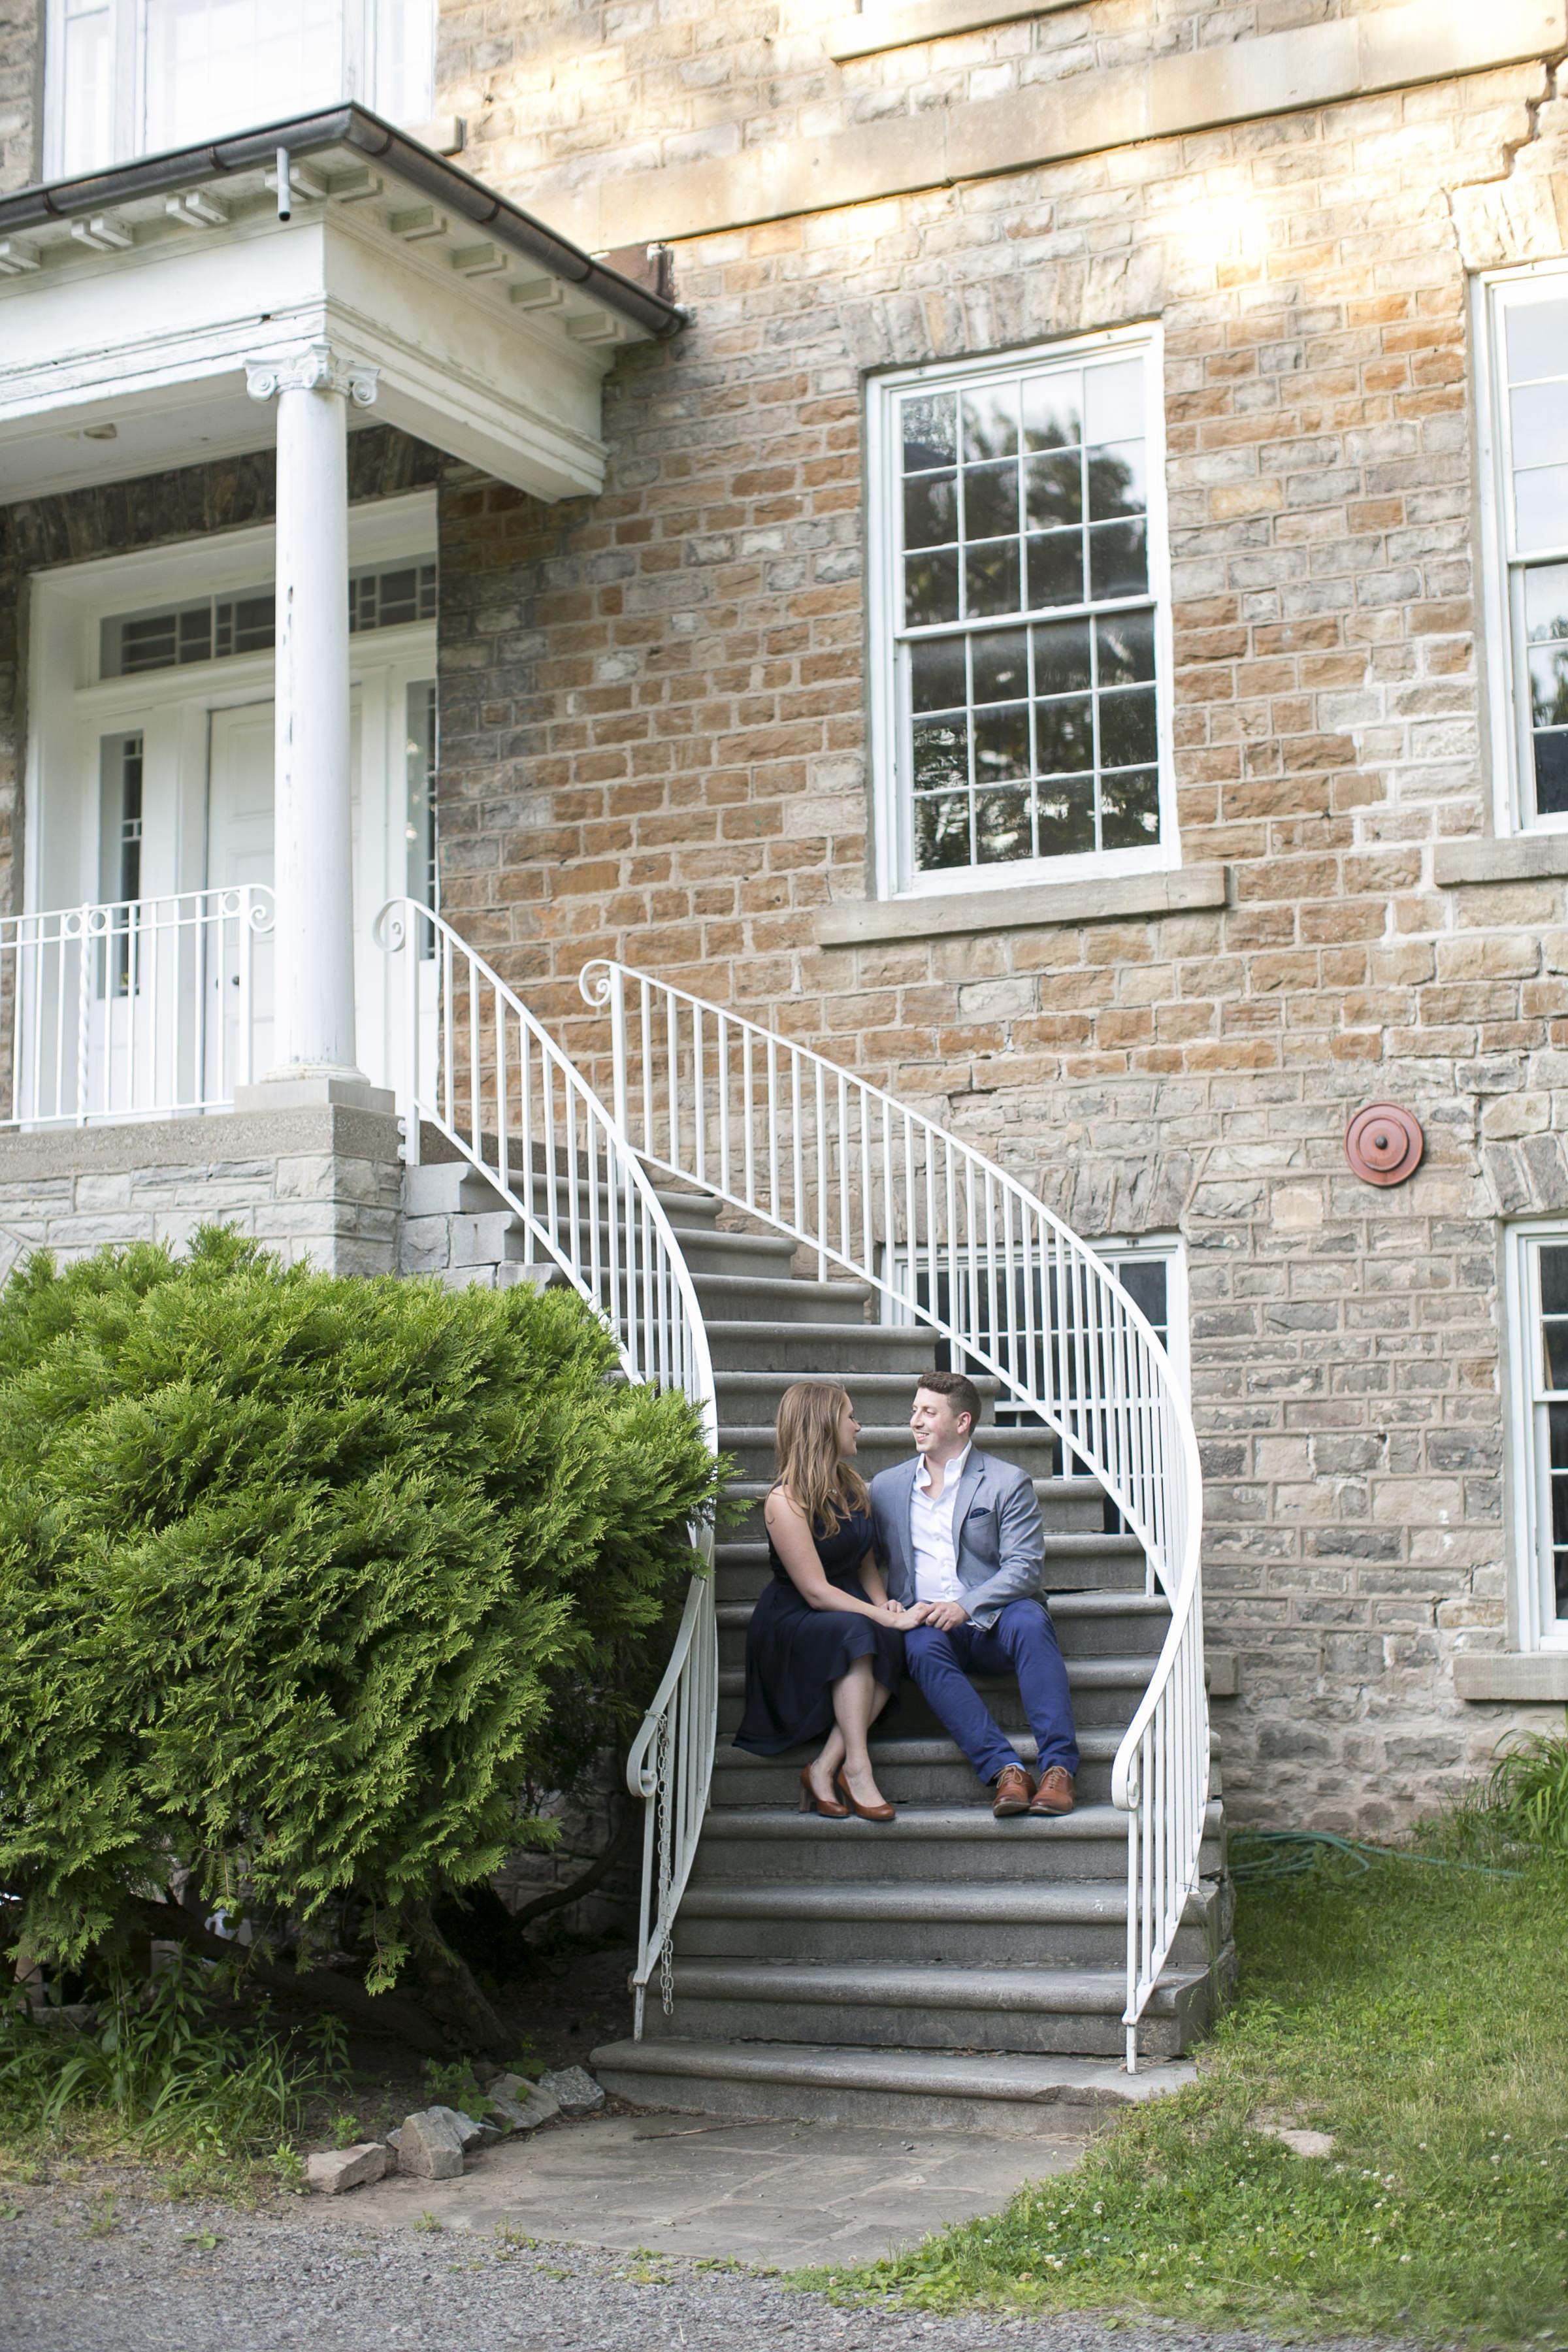 Niagara-on-the-Lake-Summer-Engagement-photos-by-Philosophy-Studios001.JPG